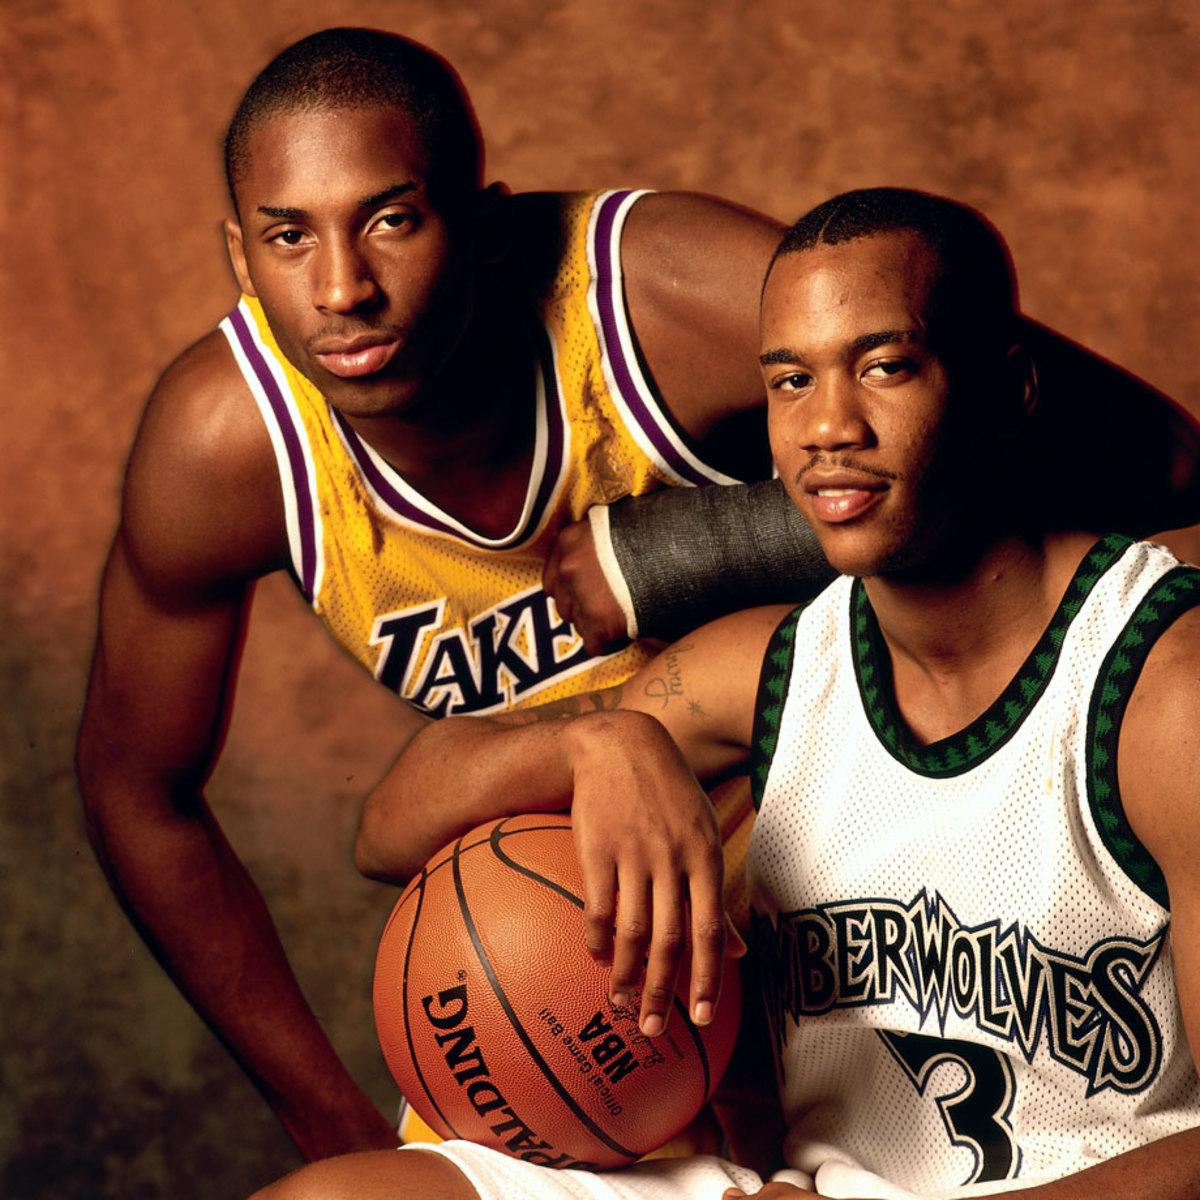 1997-Kobe-Bryant-Stephon-Marbury.jpg